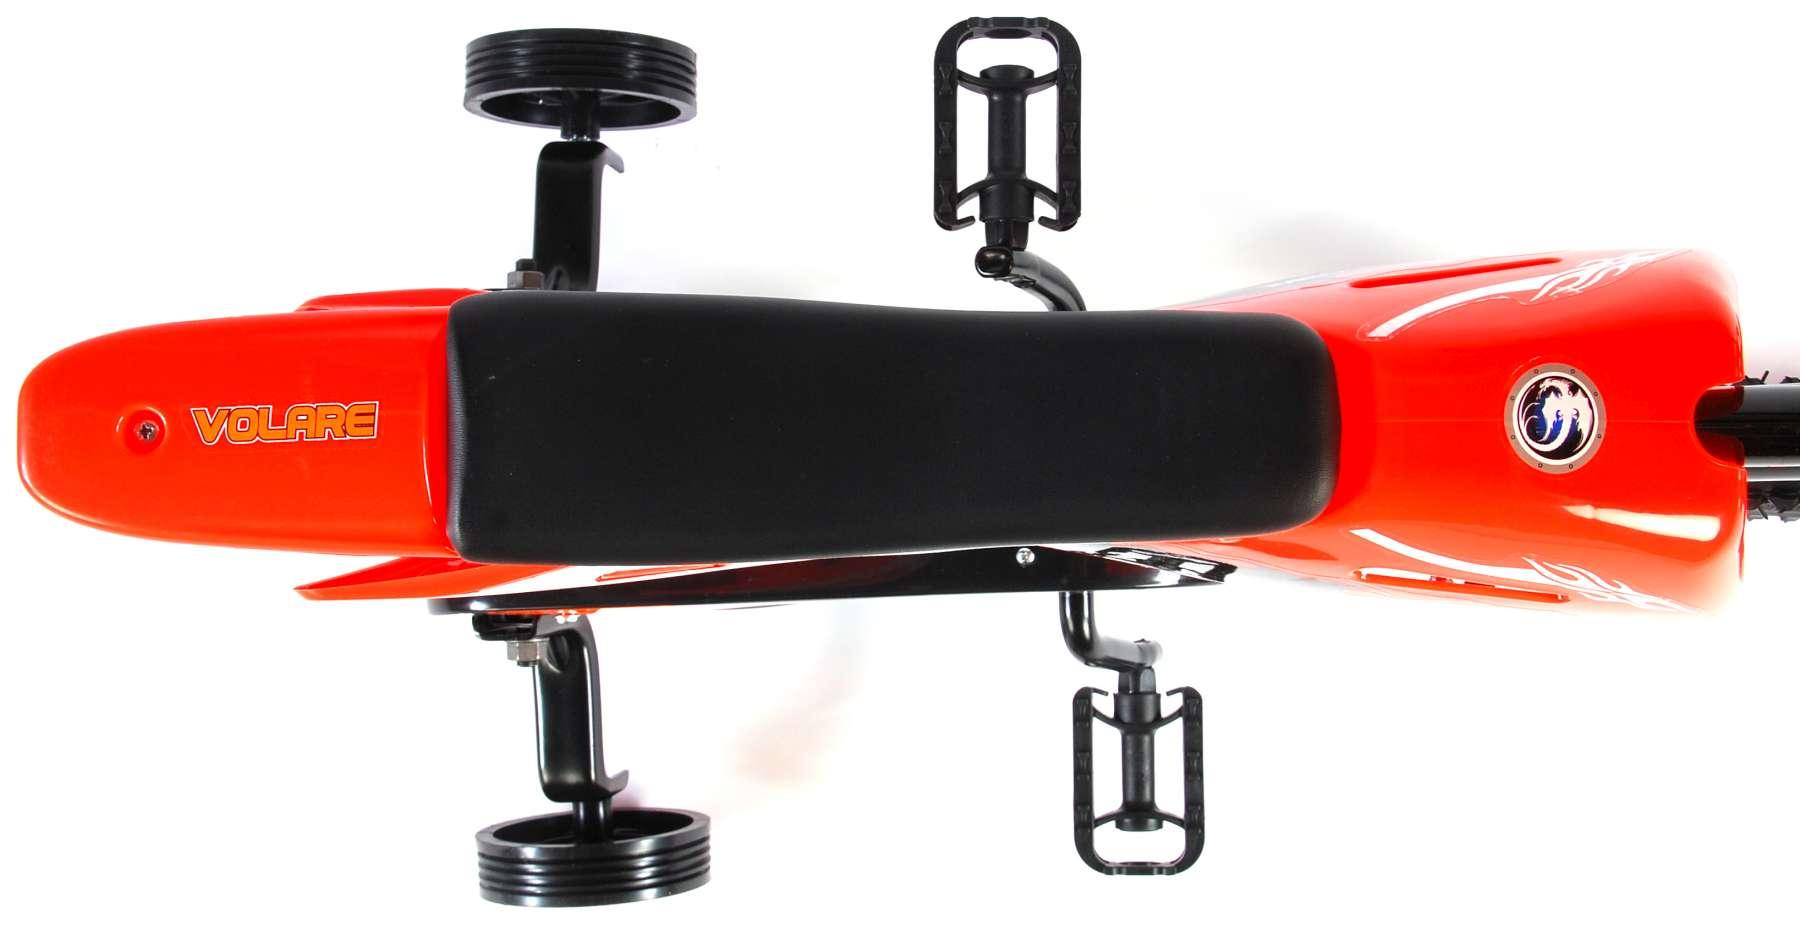 Bicicleta Motorbike de 12 pulgadas Naranja - vista superior